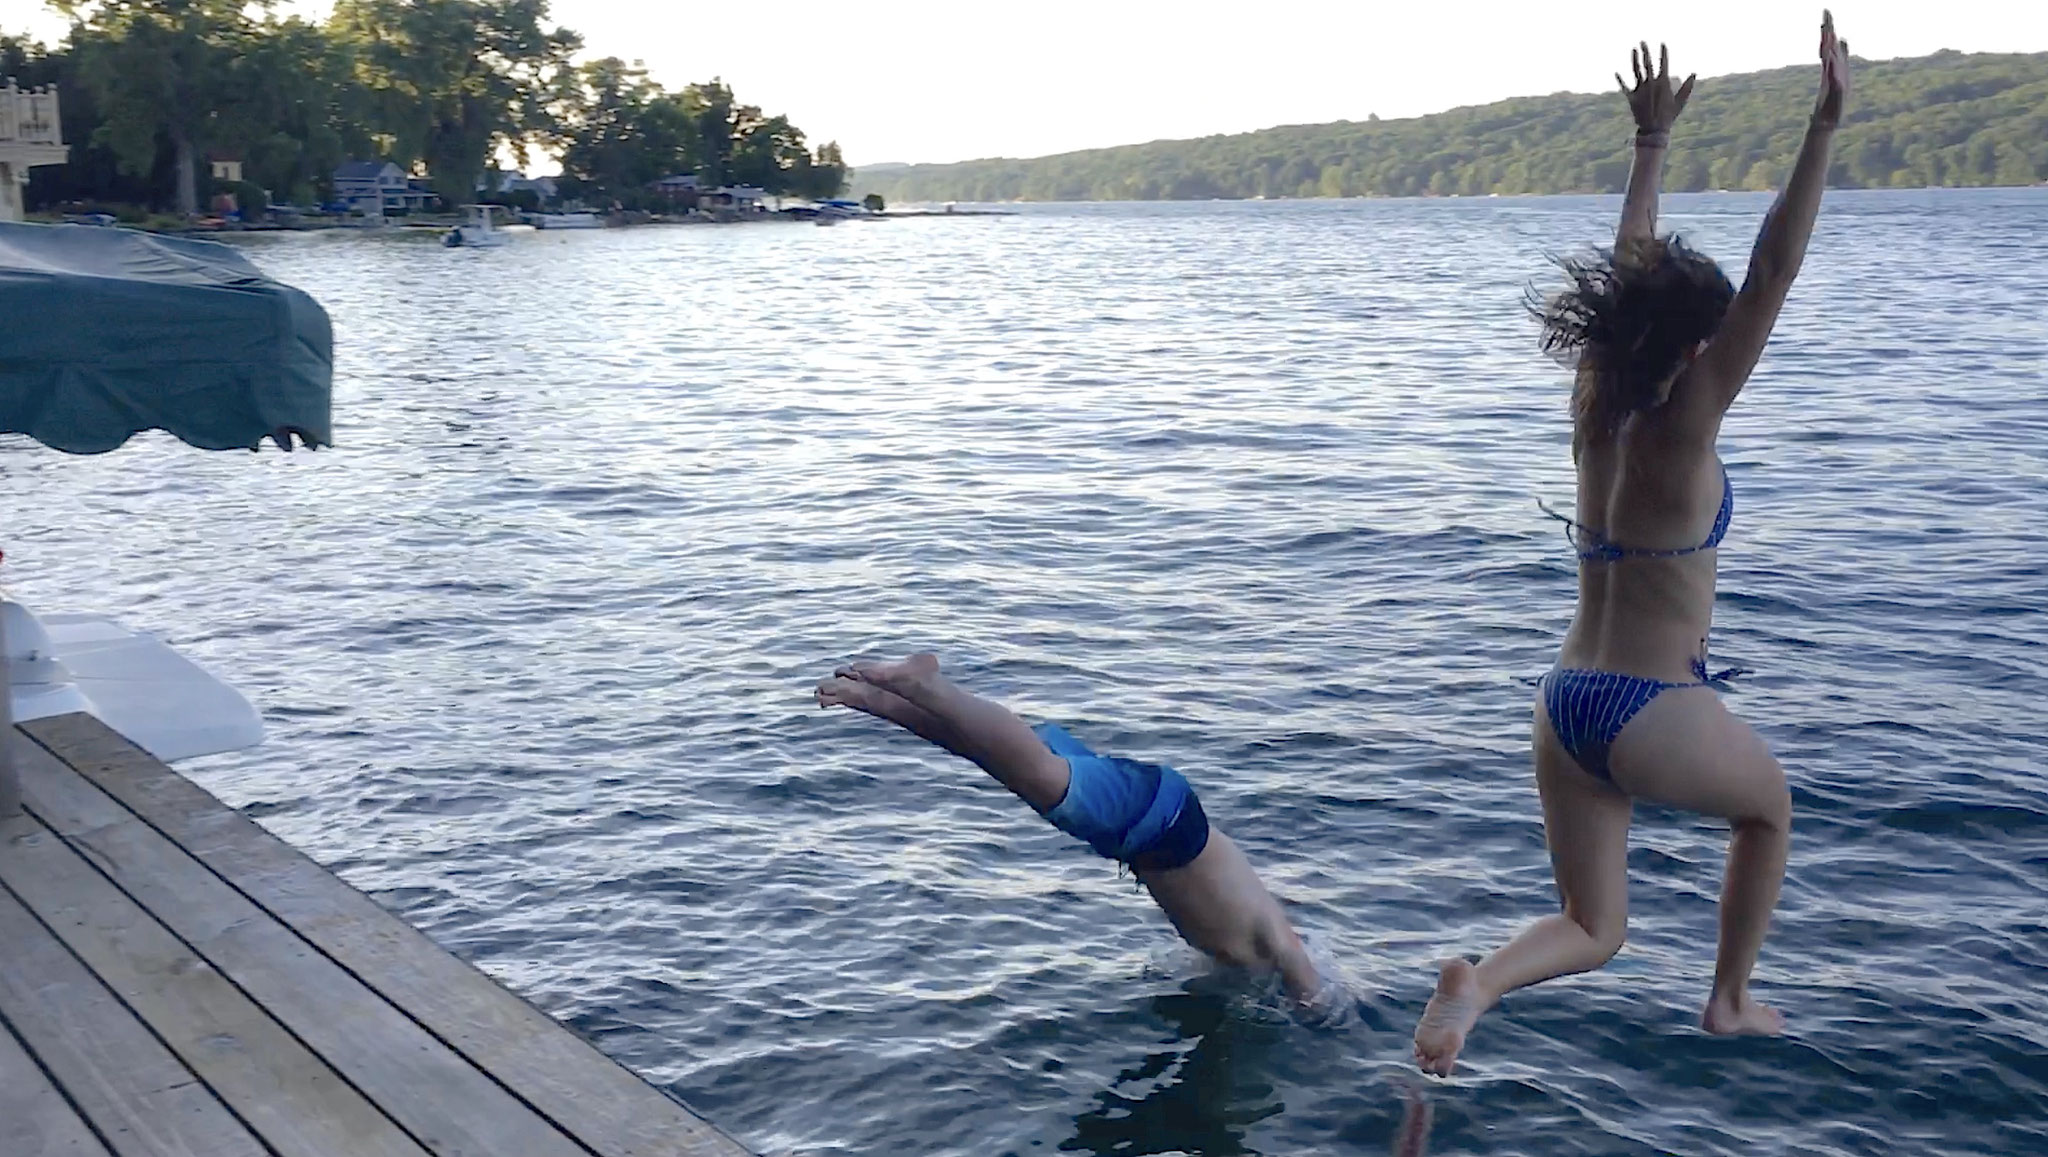 Stuart III & Ellie jump in together, 7-2020